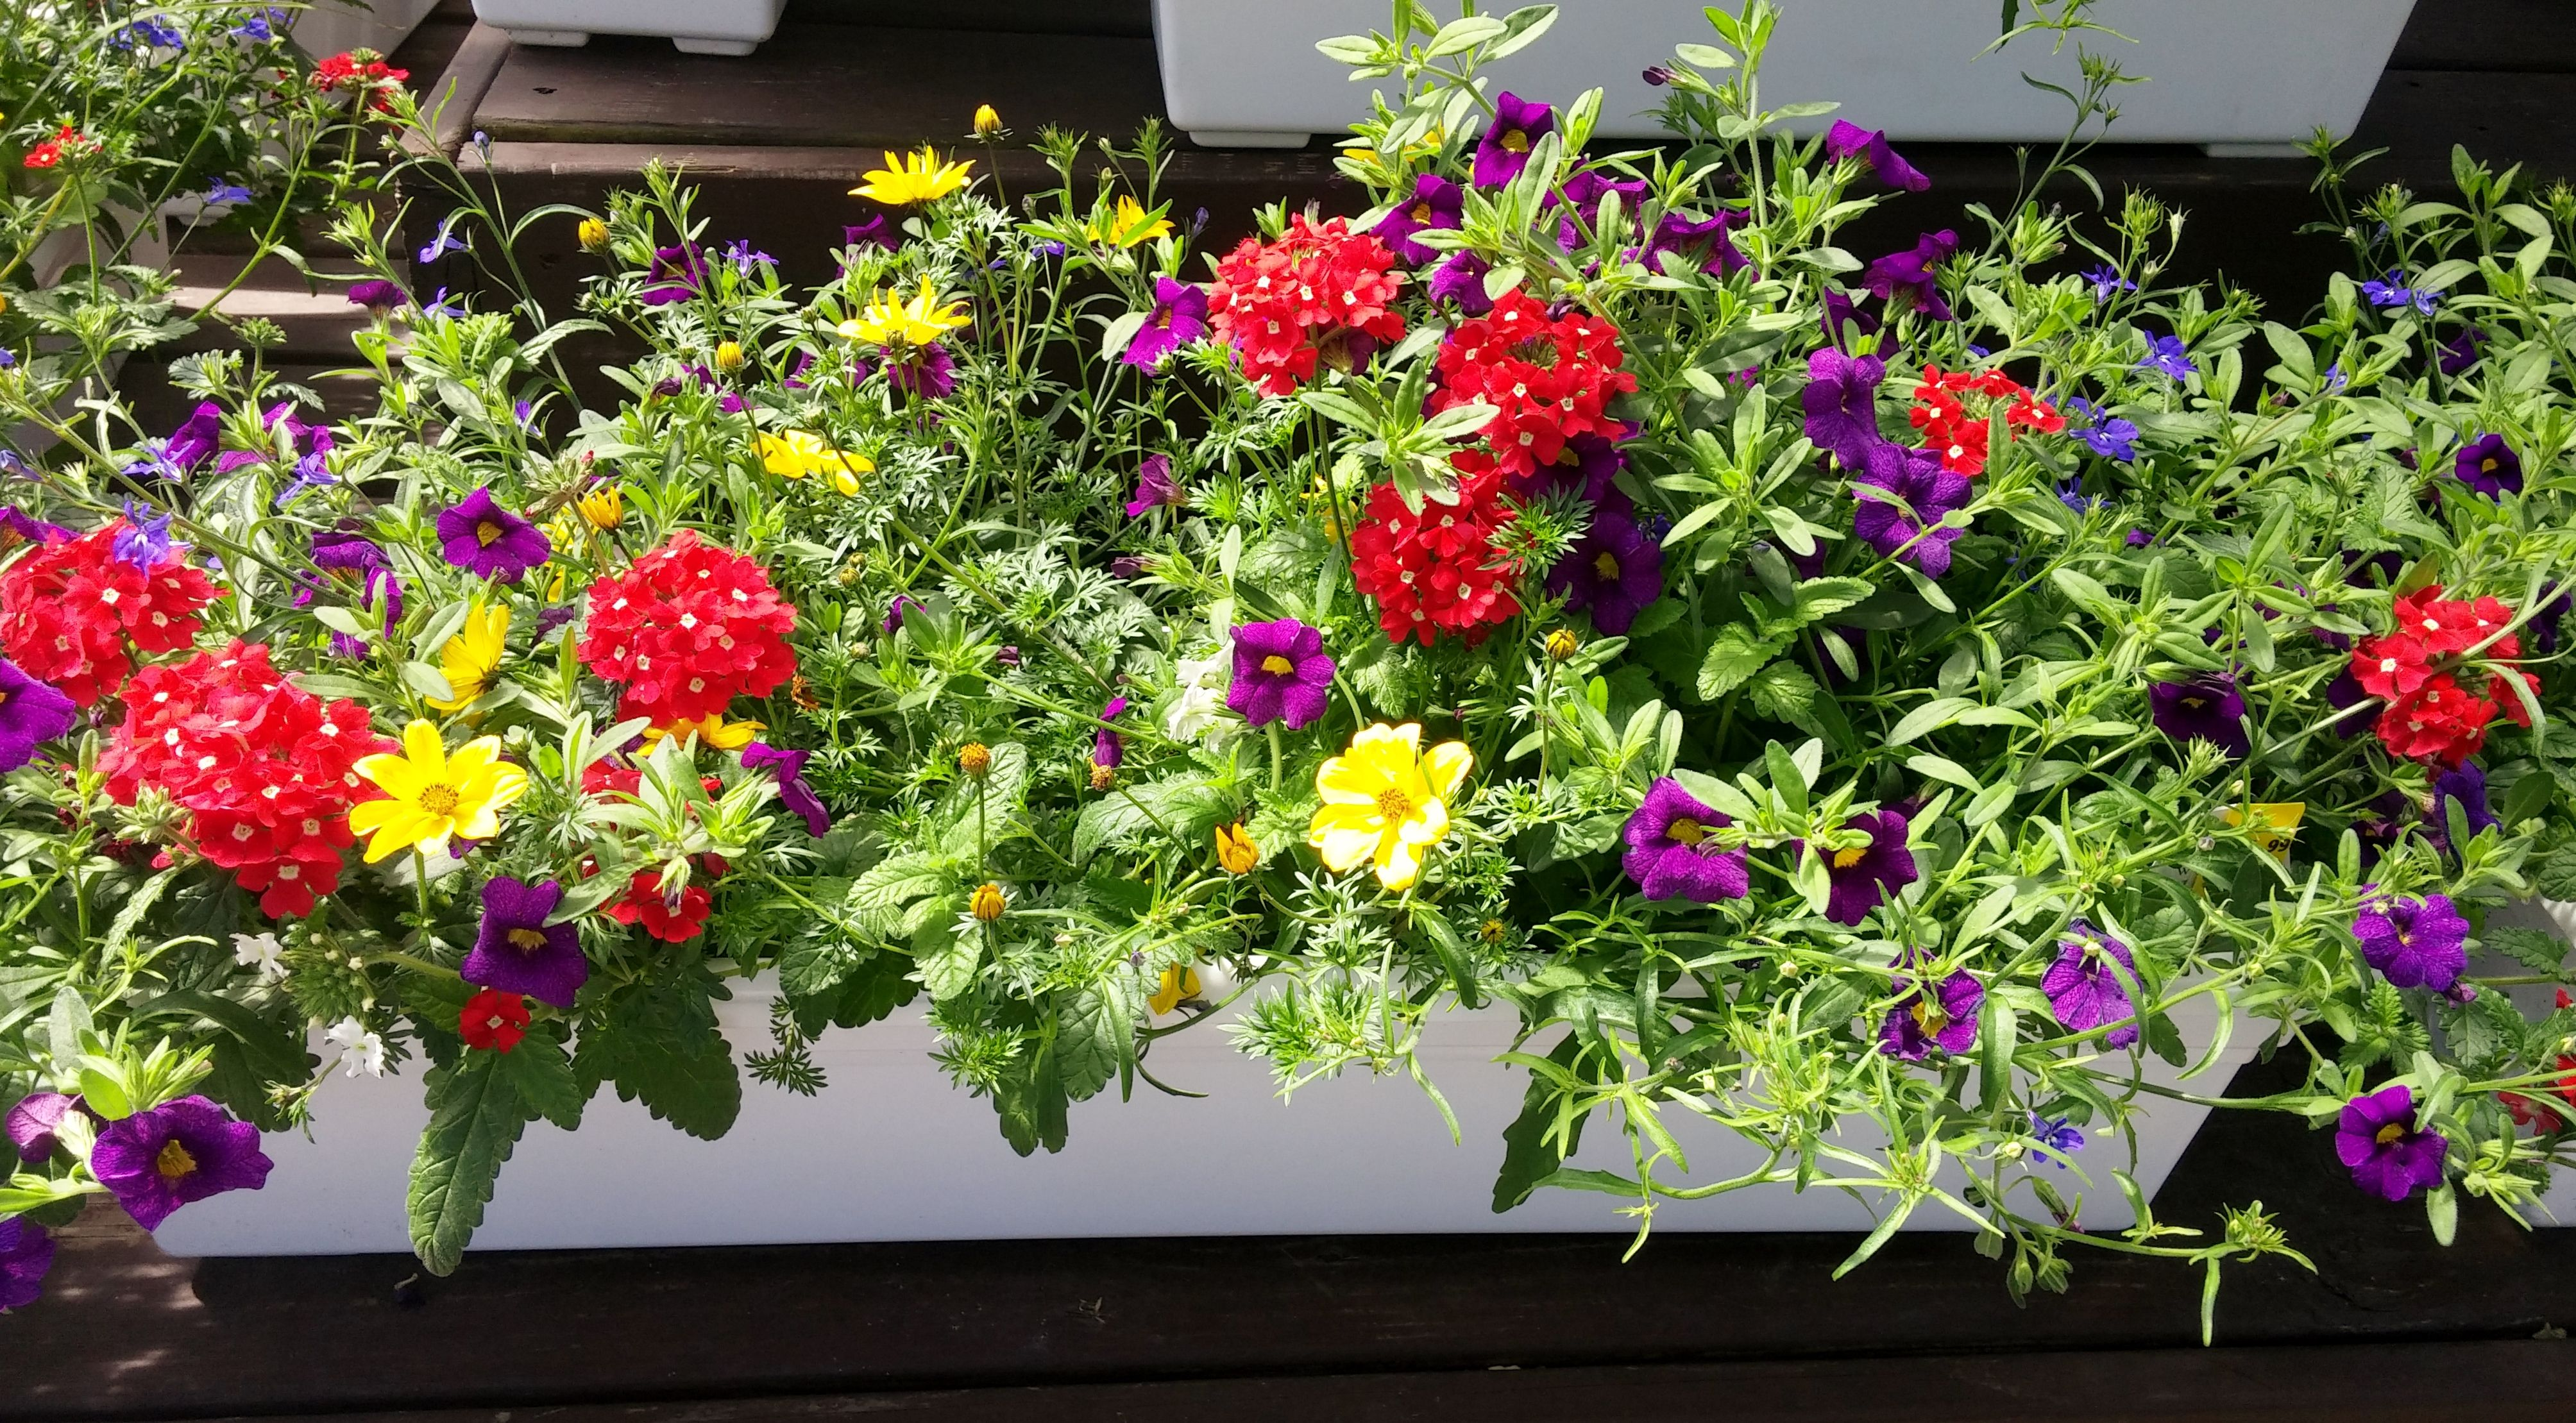 Colorful Full Sun Window Box Created By Longfellows Design Team